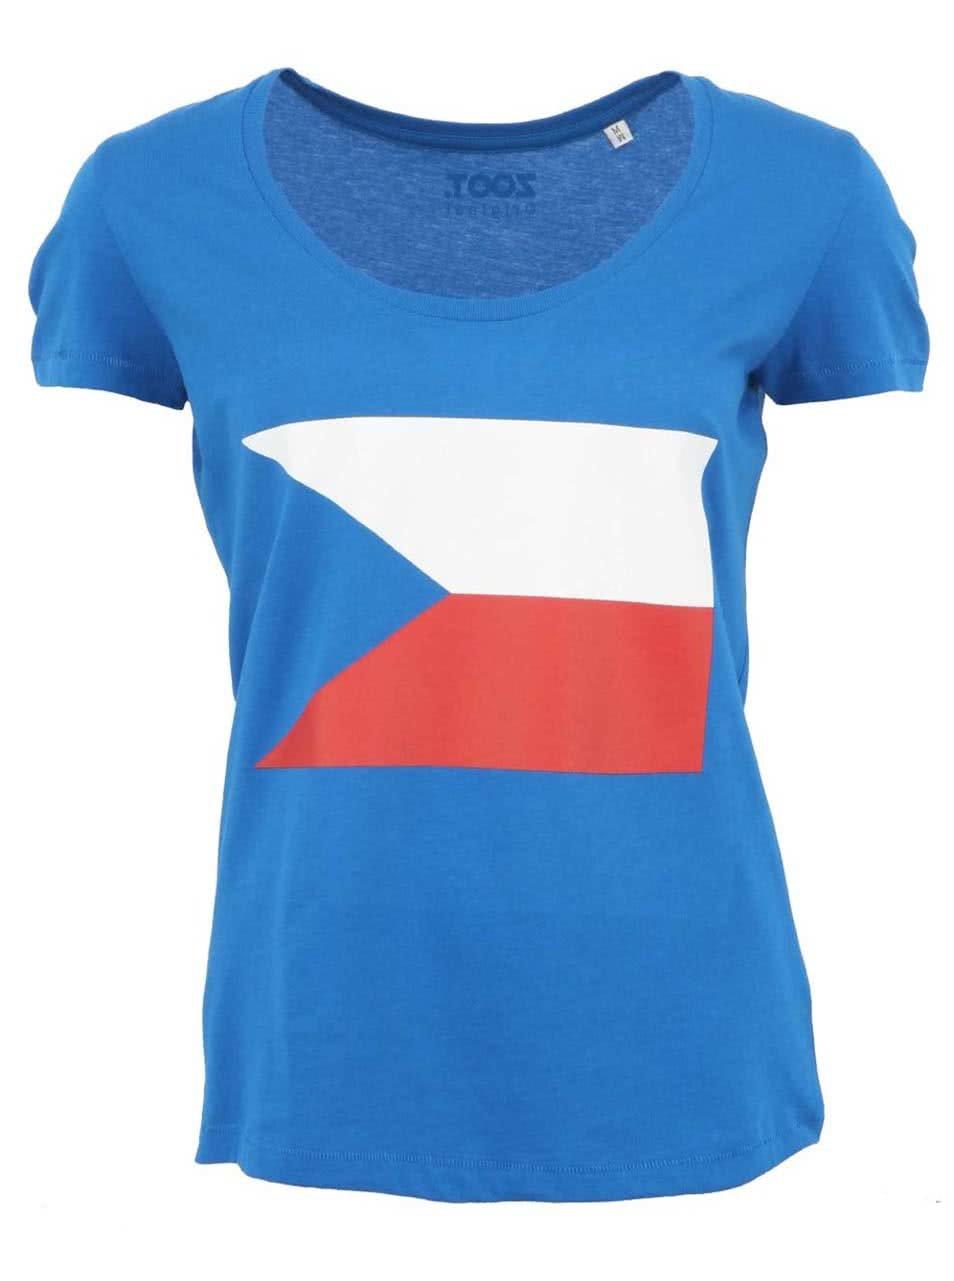 Modré dámské triko s vlajkou ZOOT Originál